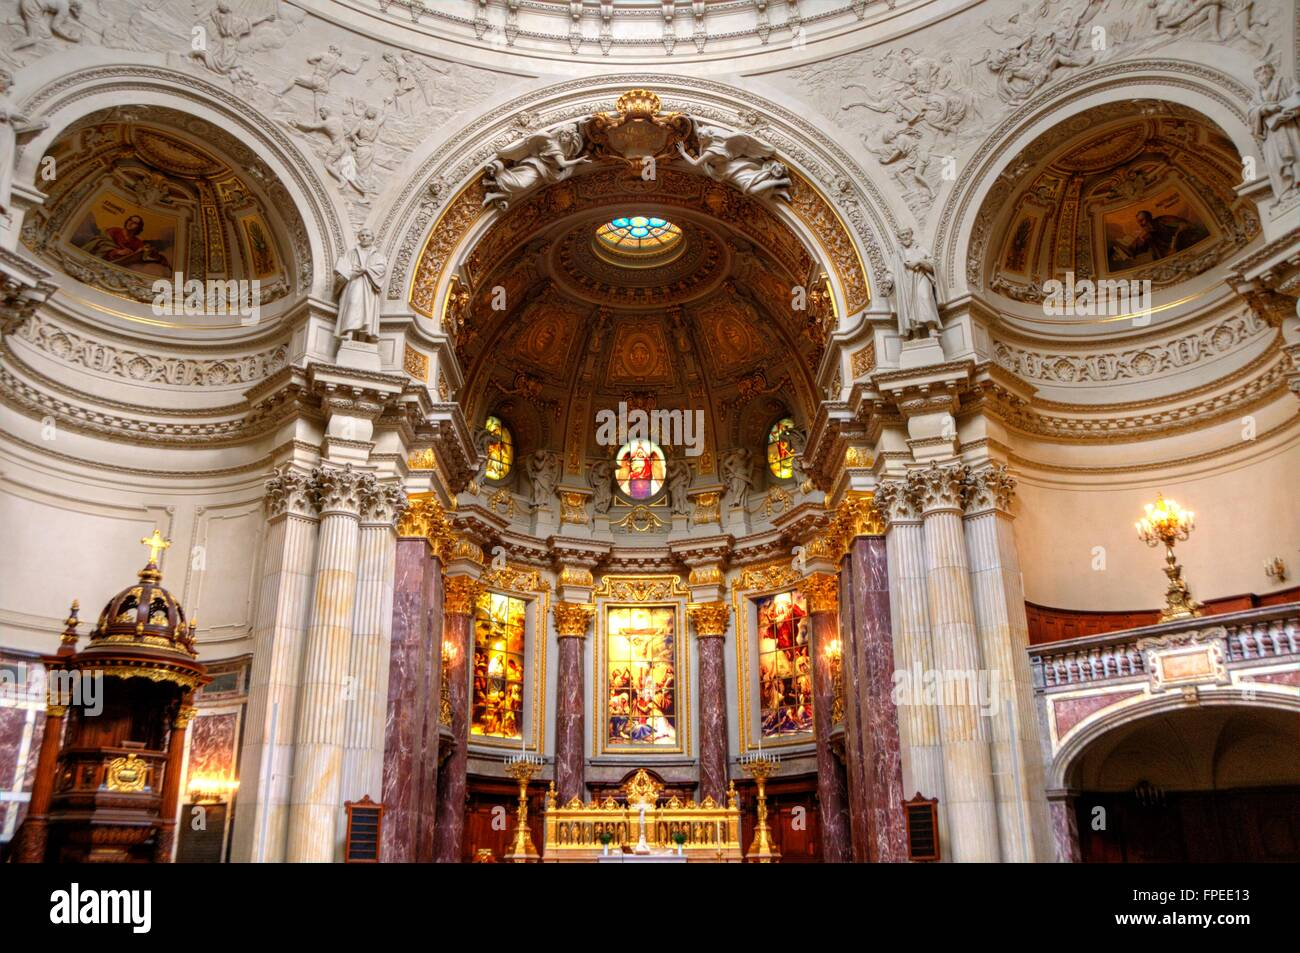 Berlin Berliner Dom innenaufnahme Kathedrale - Stock Image